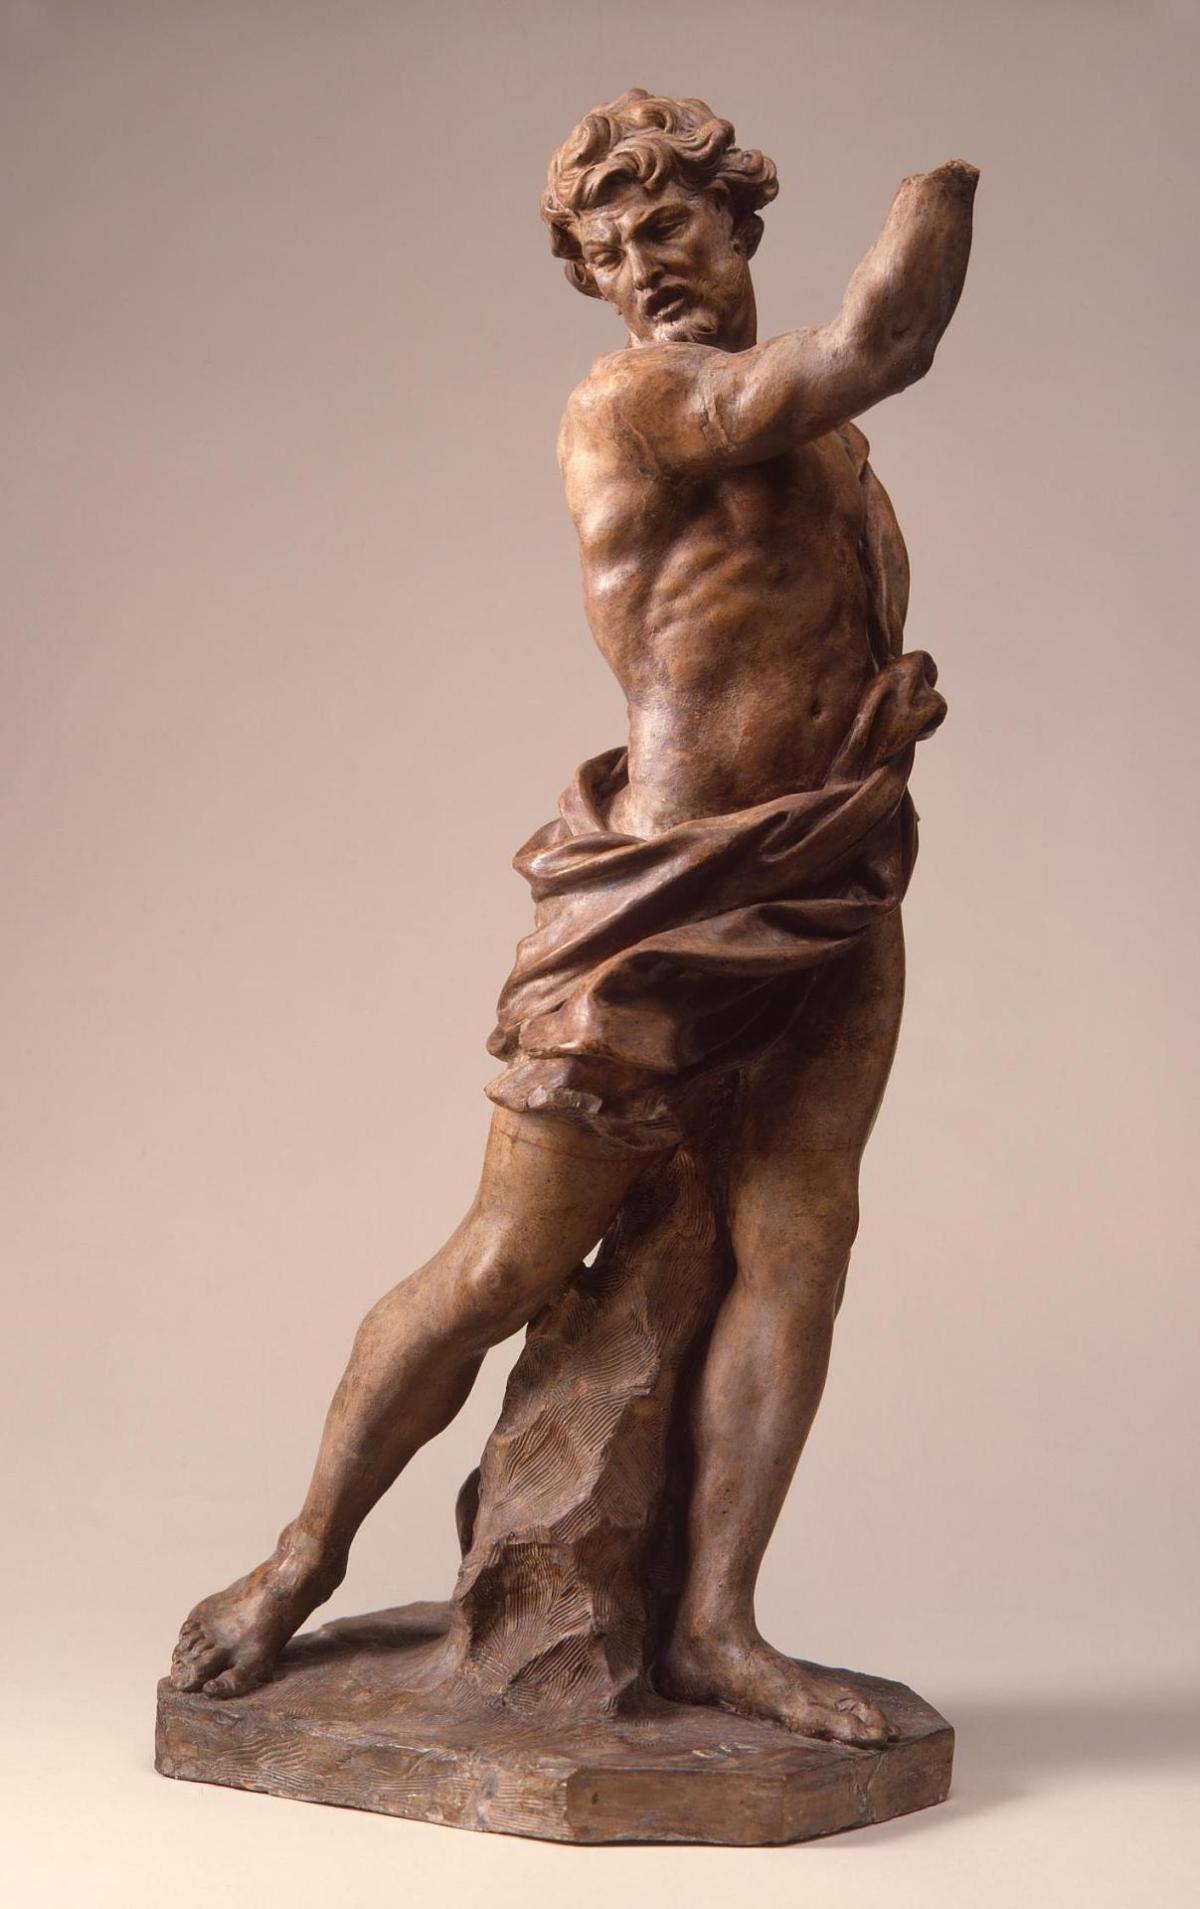 An Executioner by Alessandro Algardi